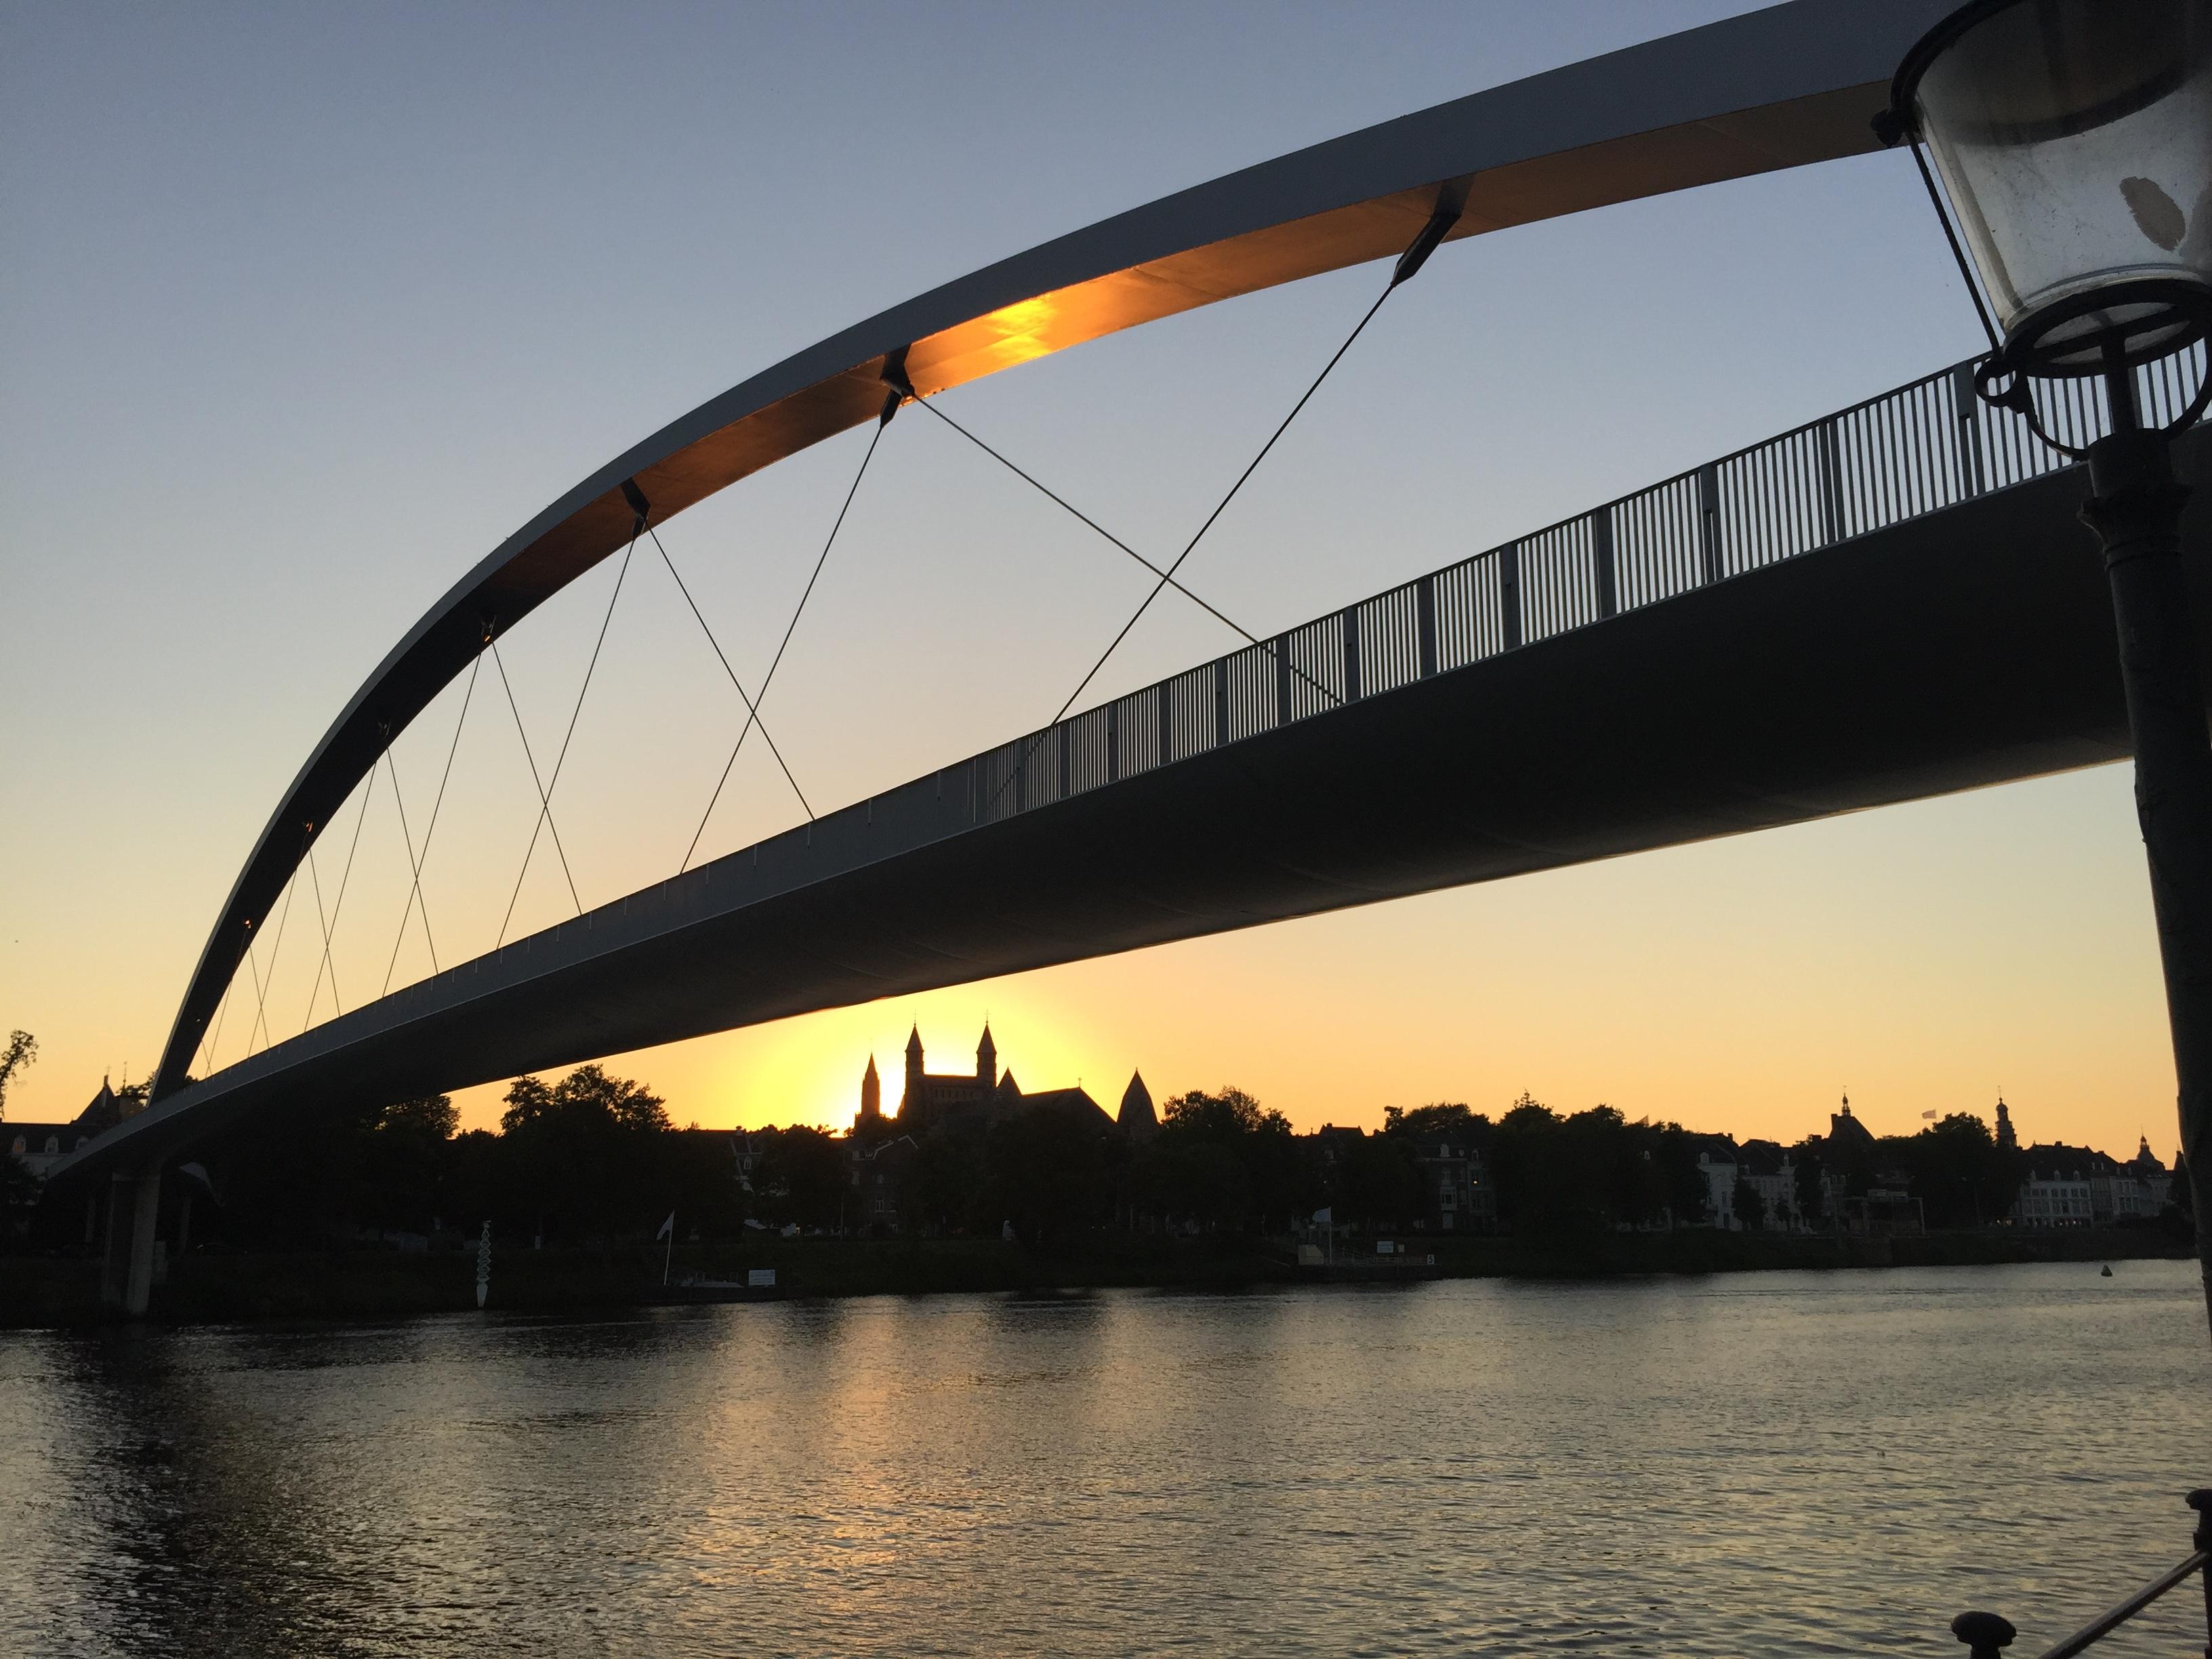 High Bridge or New Bridge